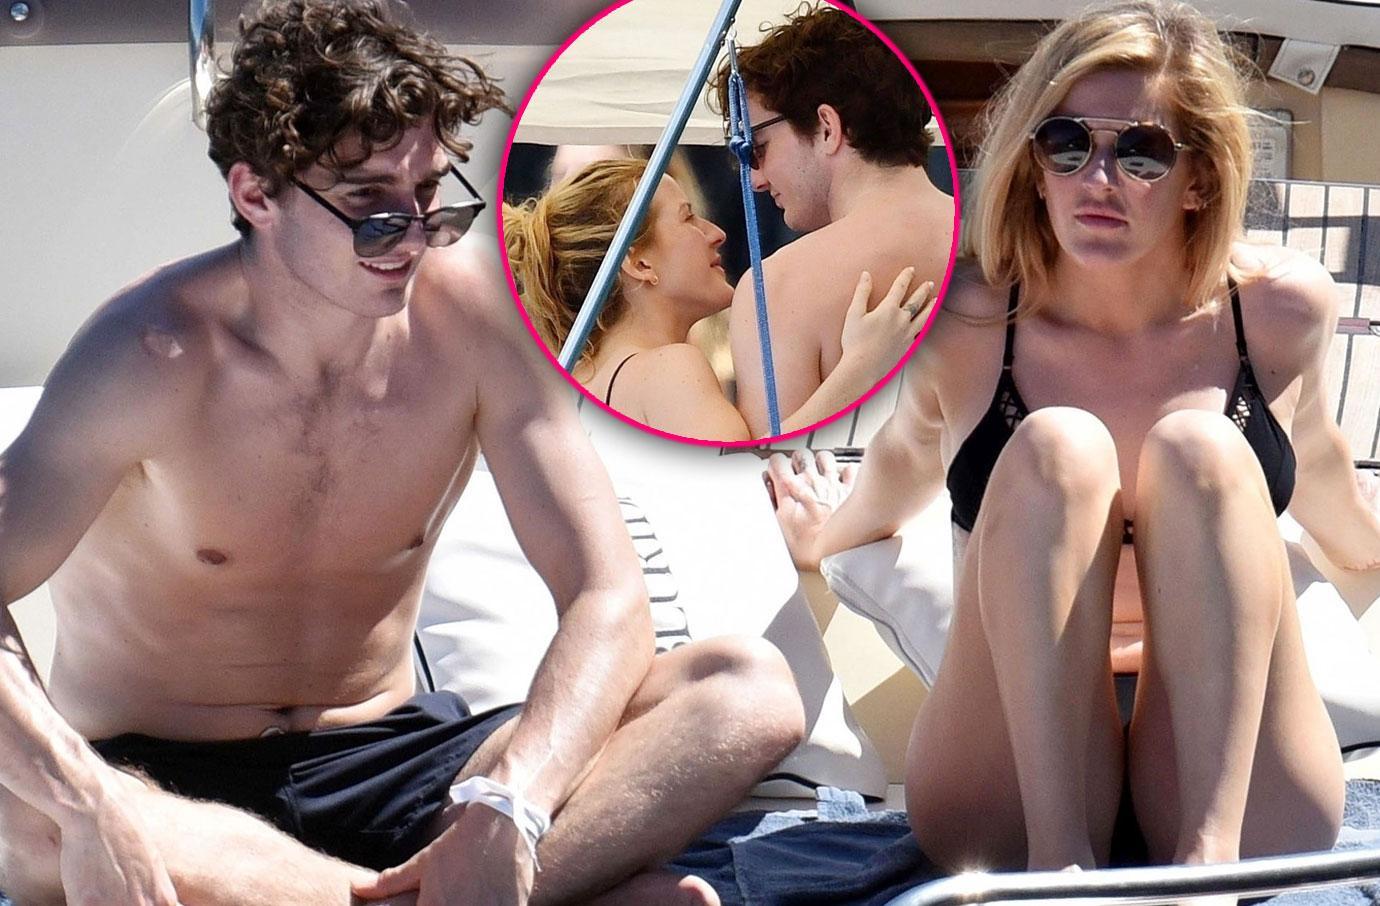 Singer Ellie Goulding Vacations With Boyfriend Caspar Jopling Bikini Pics